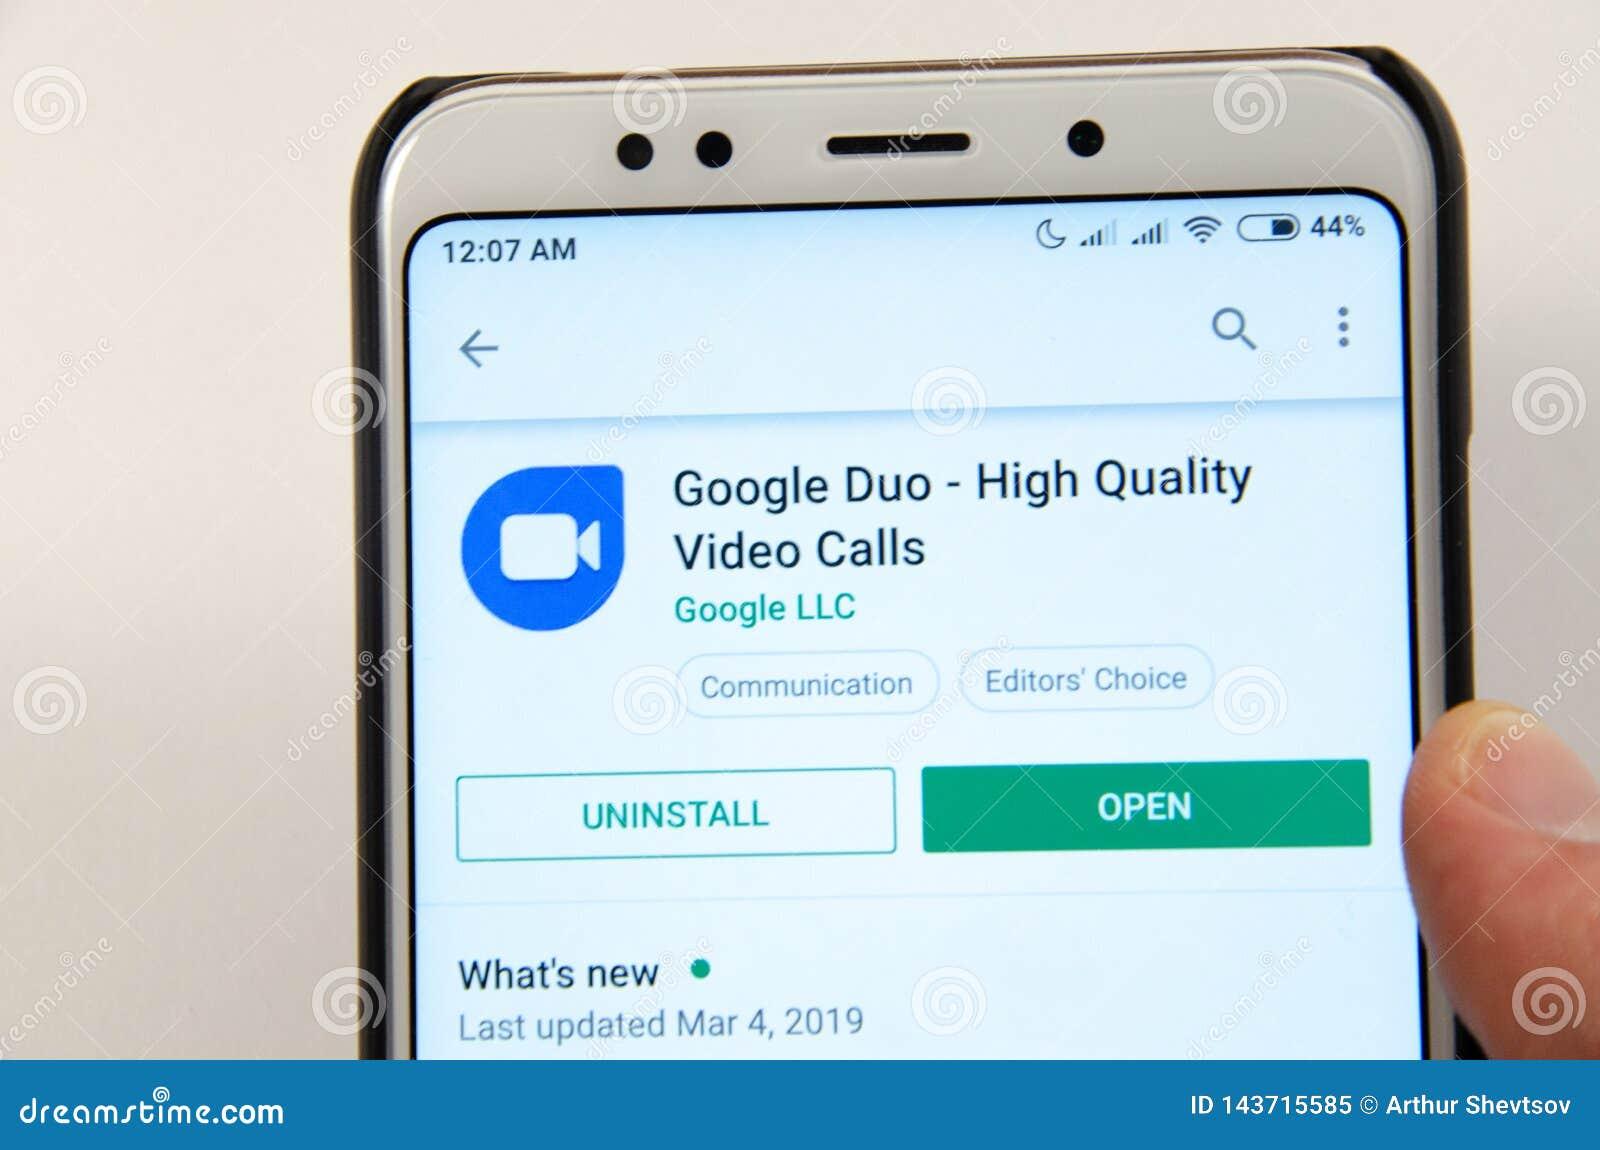 April, 2019. Kramatorsk, Ukraine. Mobile application Google Duo on a white smartphone